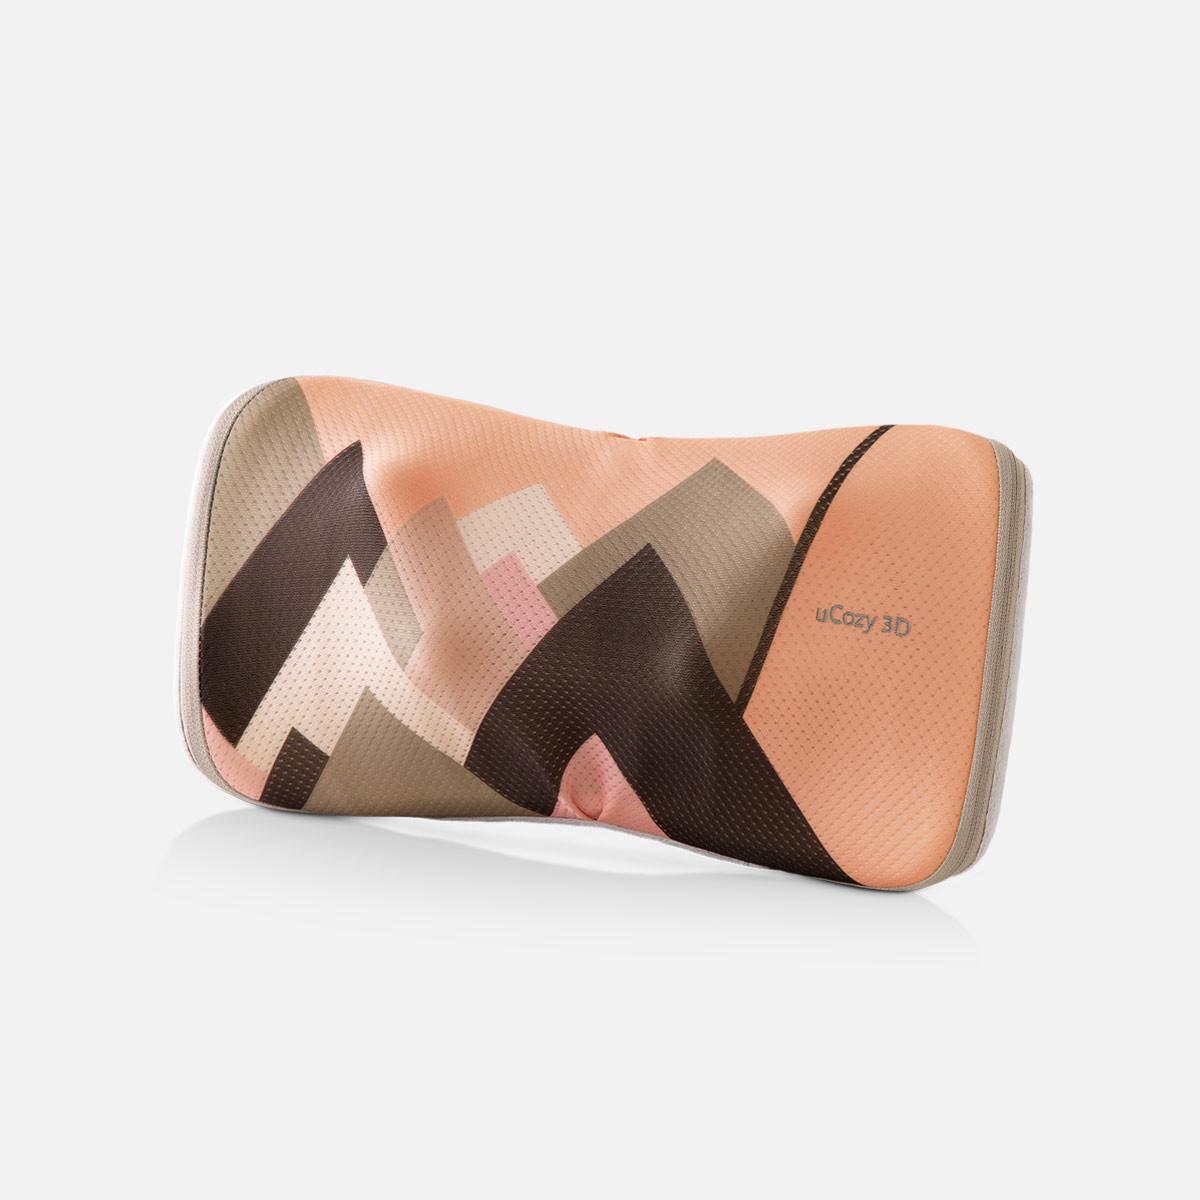 3D暖暖枕 (黑色送貨期為2月上旬)